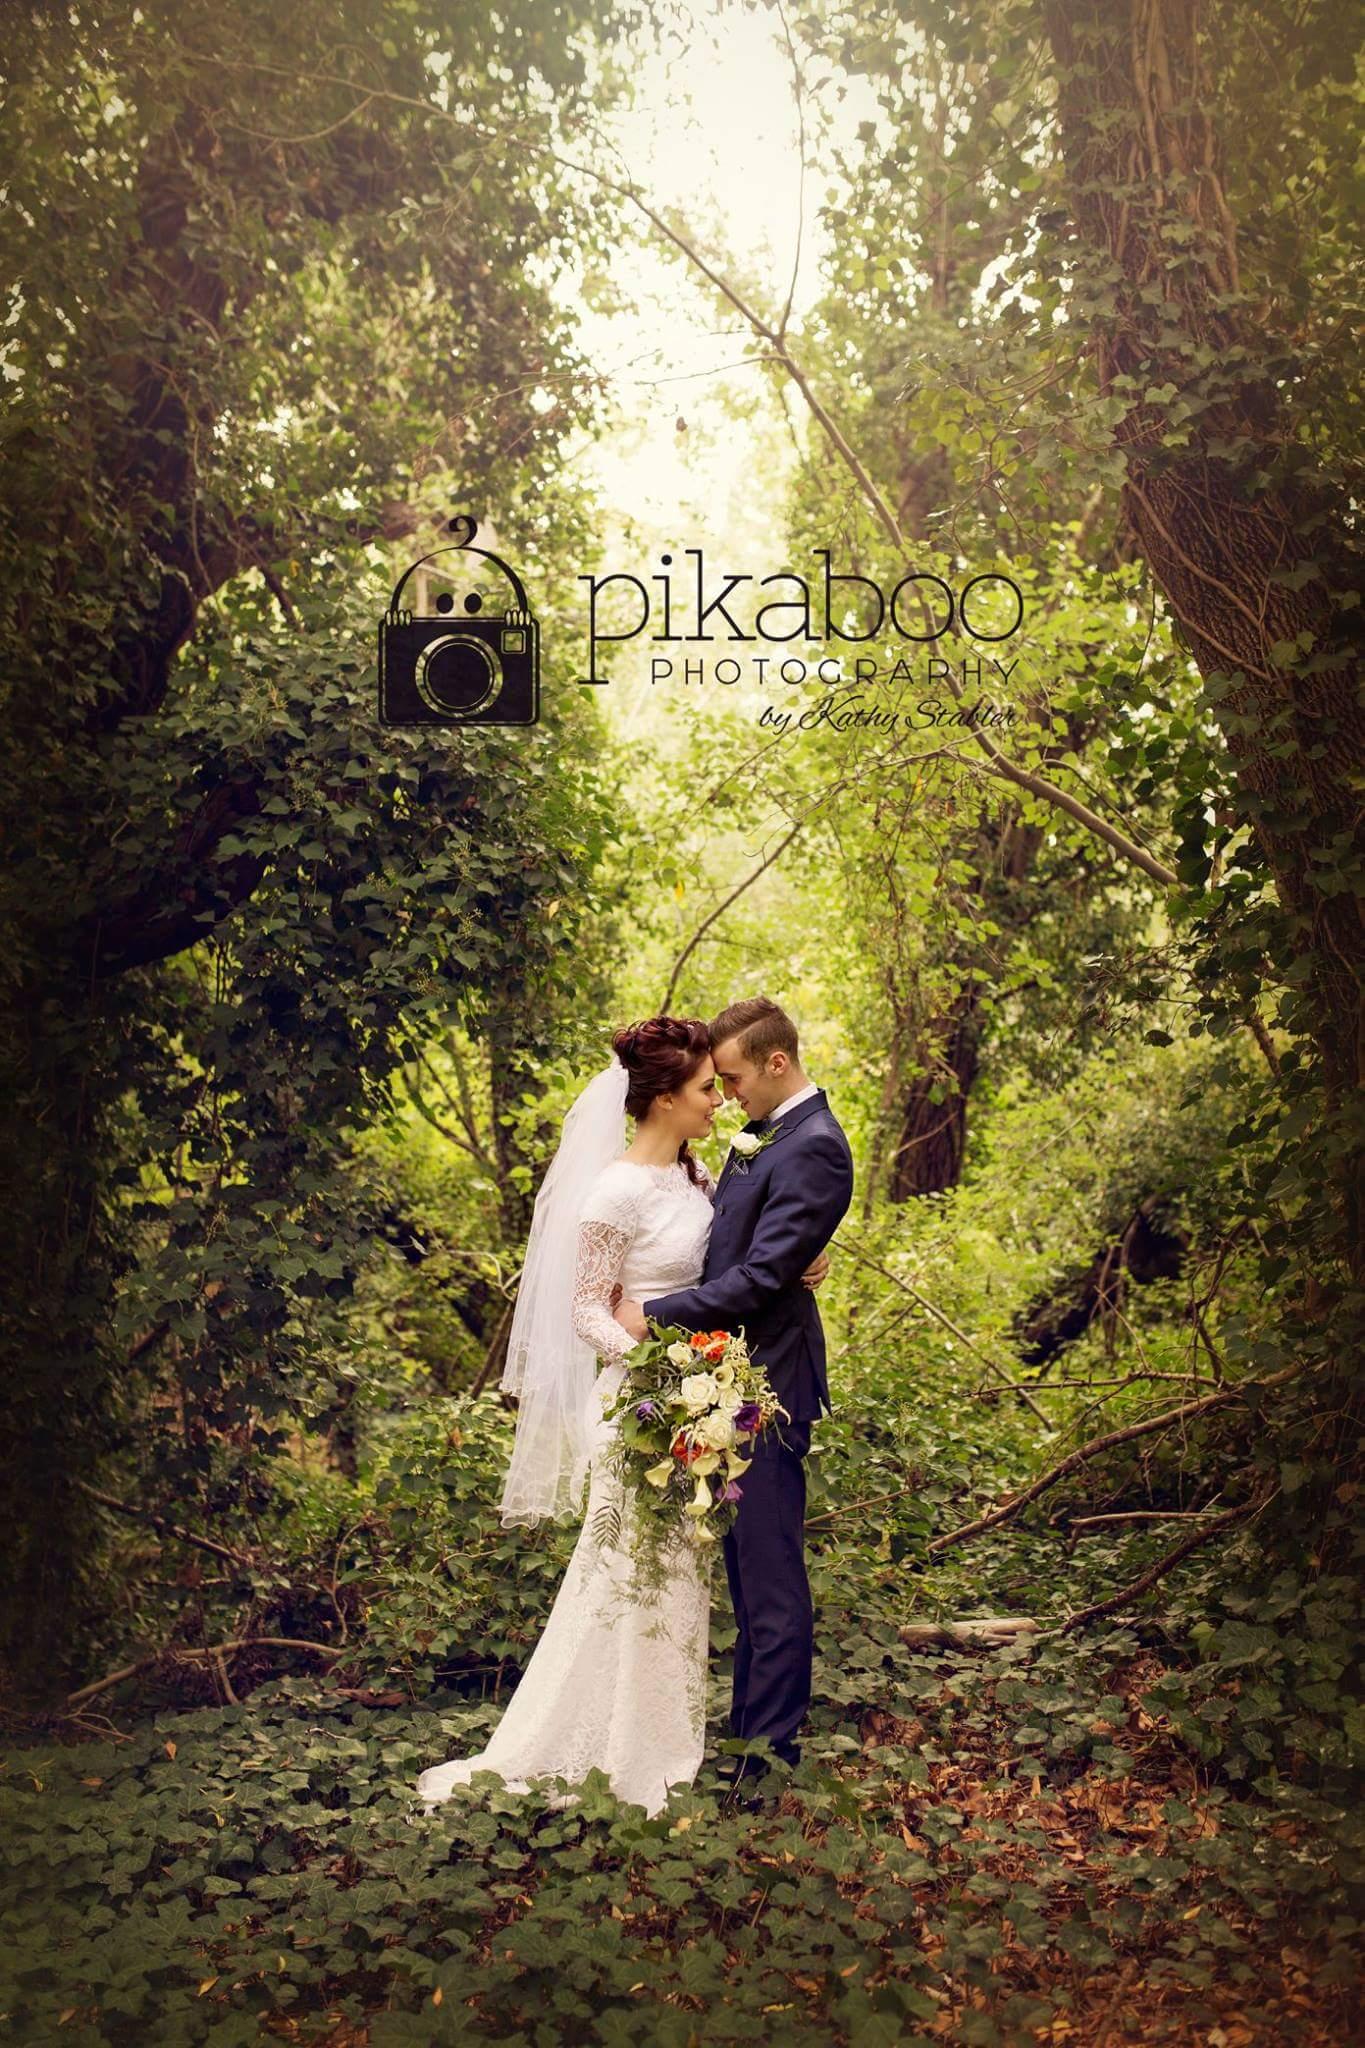 Poses Archives Pikaboo Photography Portfolio